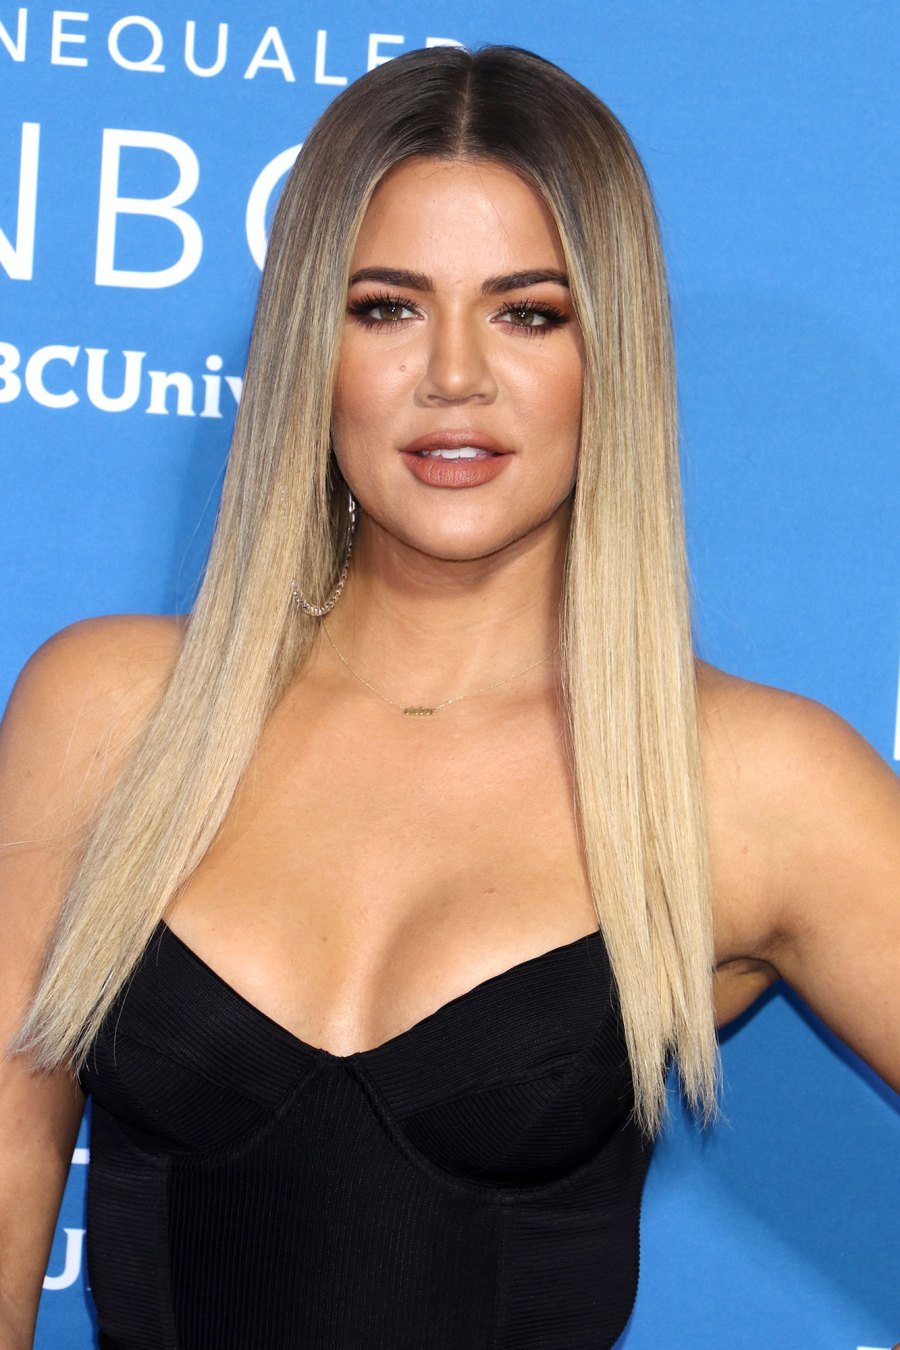 Take That Trolls Khloe Kardashian Kardashian-Jenner Sisters Parenting Clapbacks Over the Years